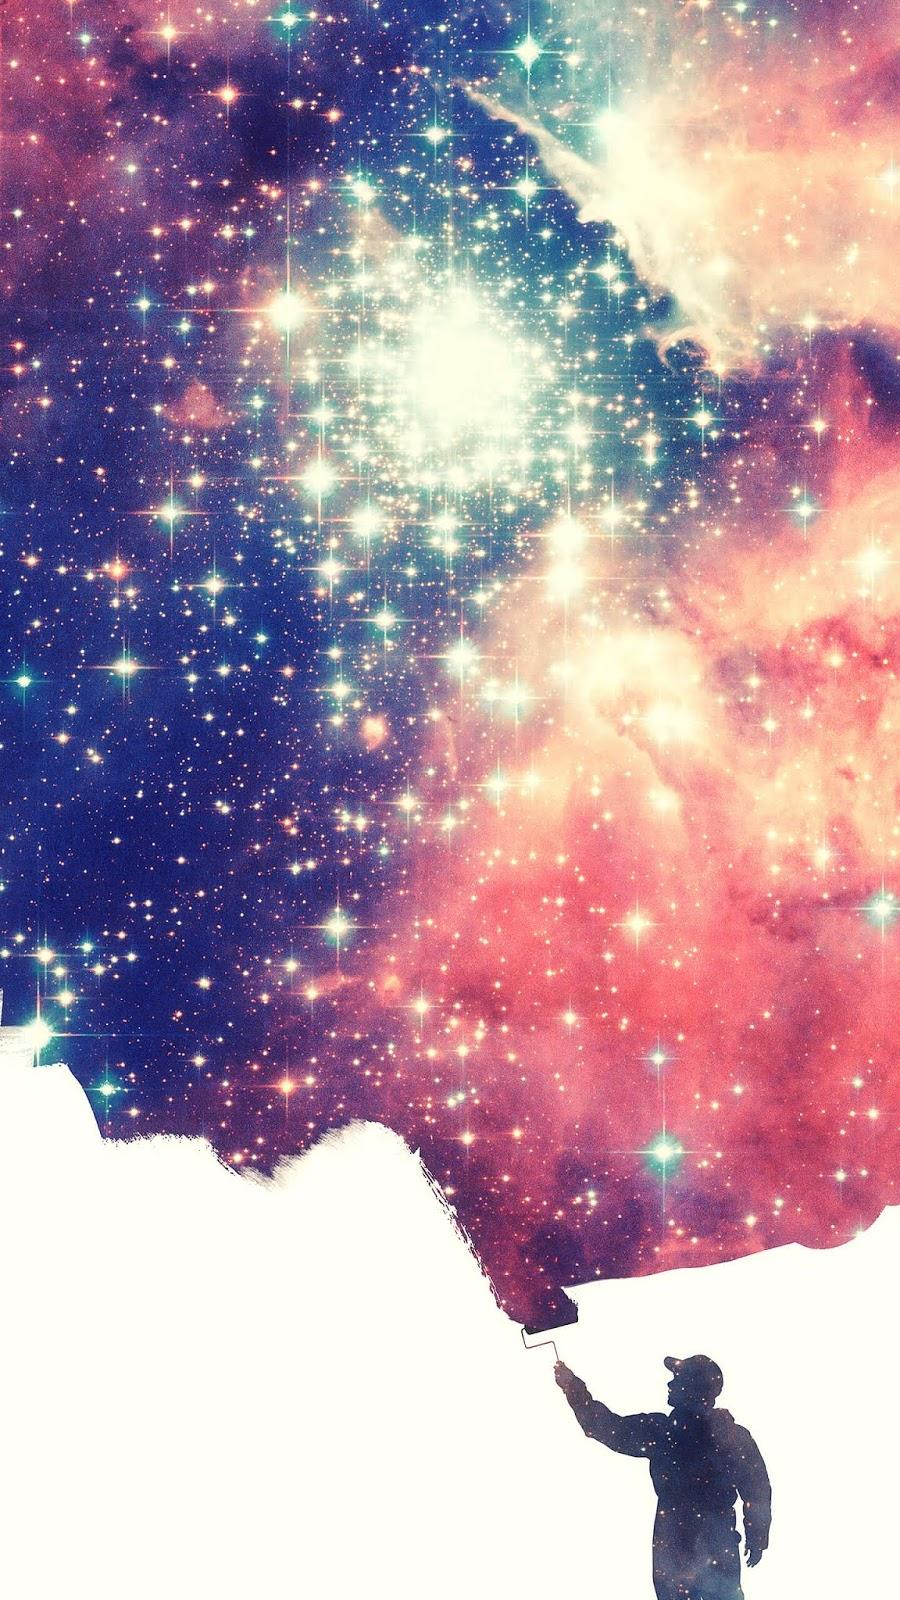 Panting the universe